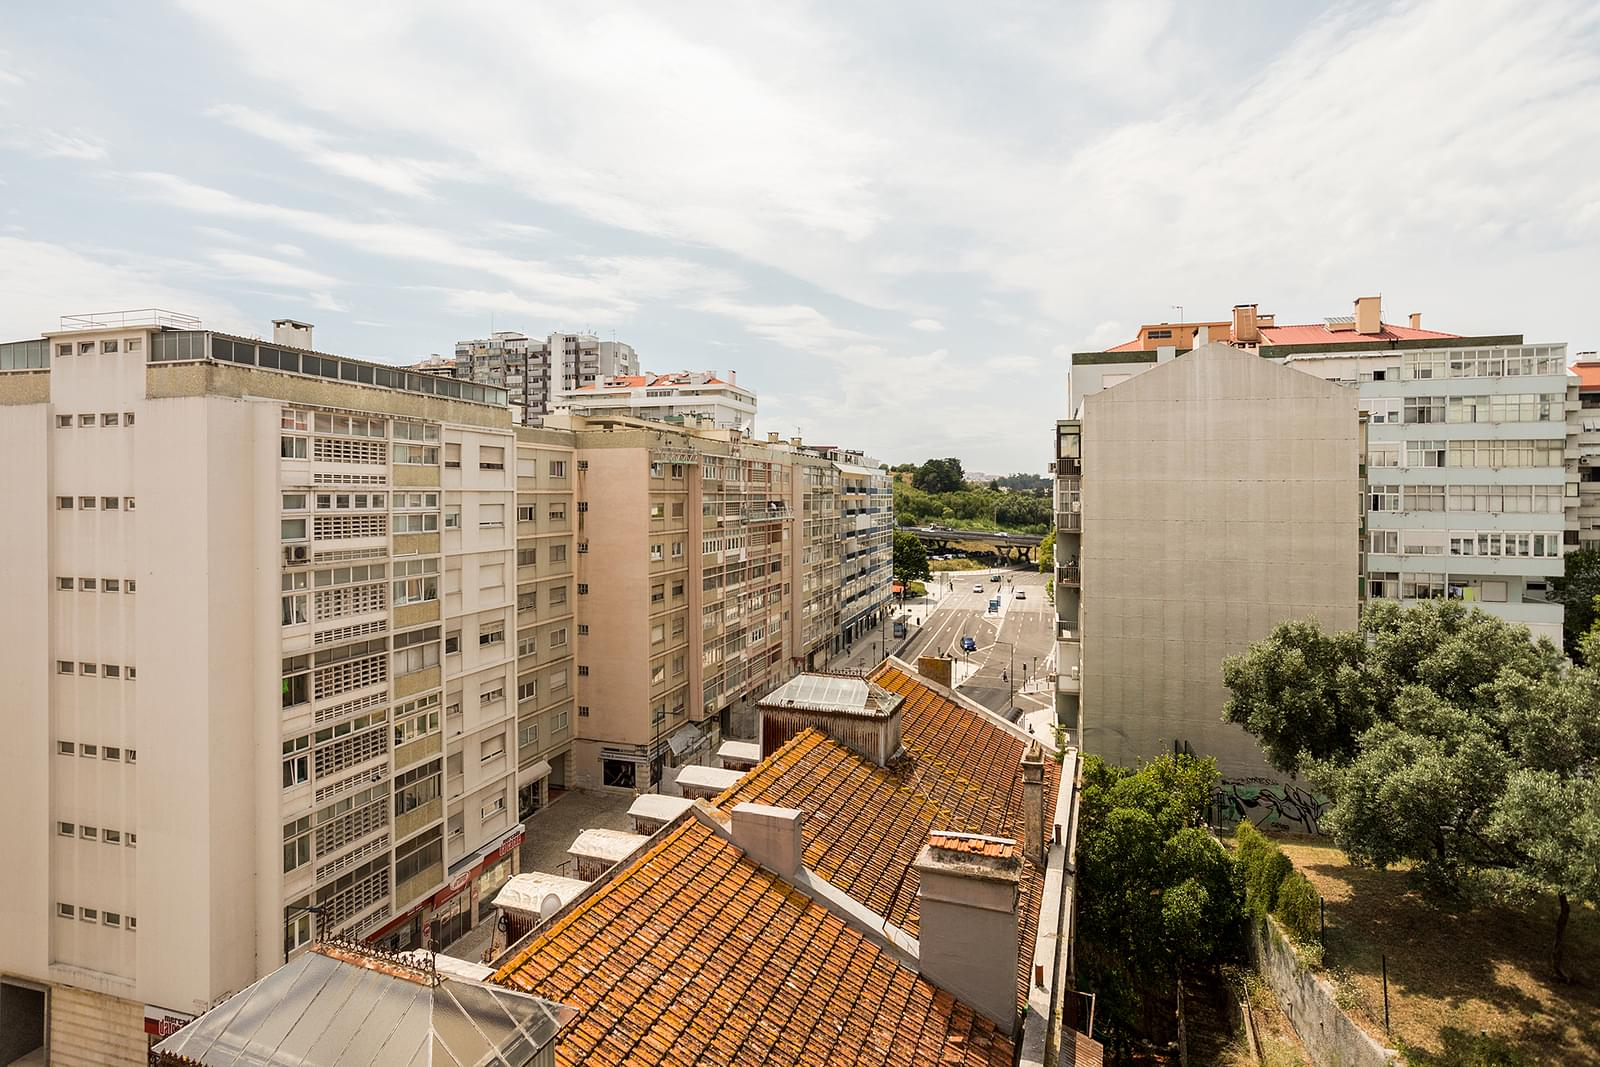 pf17340-apartamento-t3-lisboa-3ebce34d-d80e-4f2c-87bc-23c05ce812e5